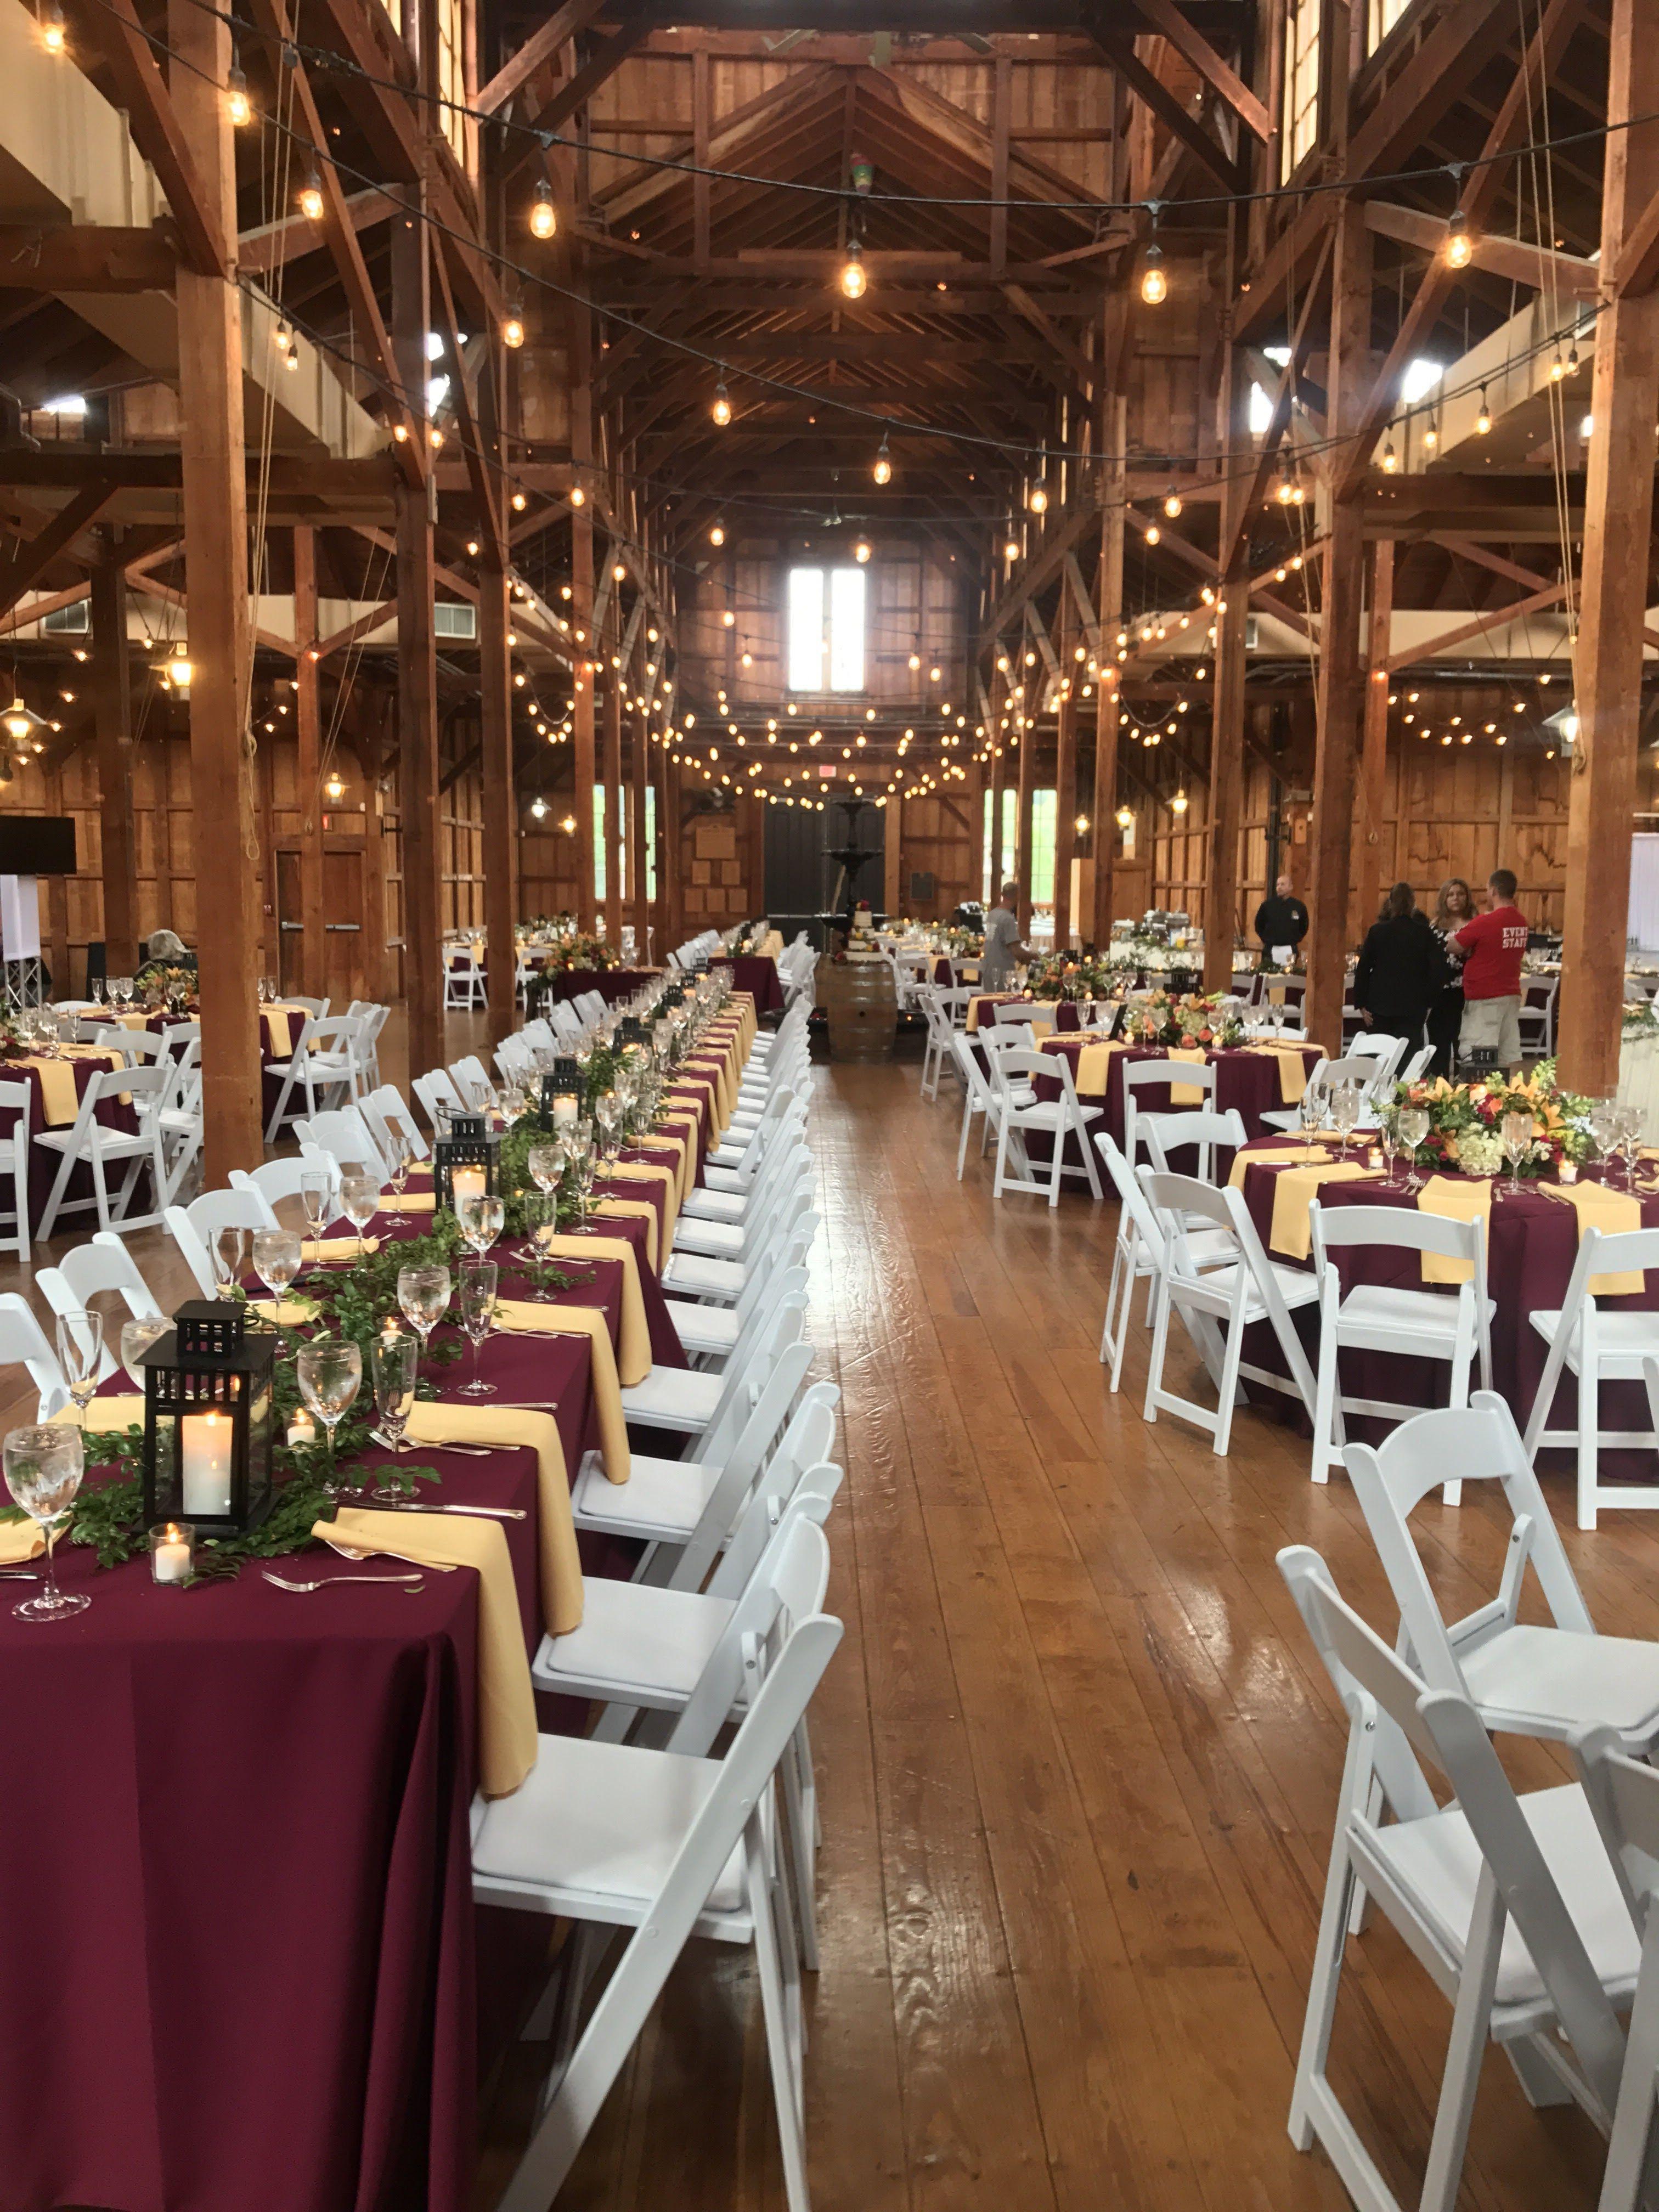 Barn Wedding Venues London Ontario - BARN DESIGN